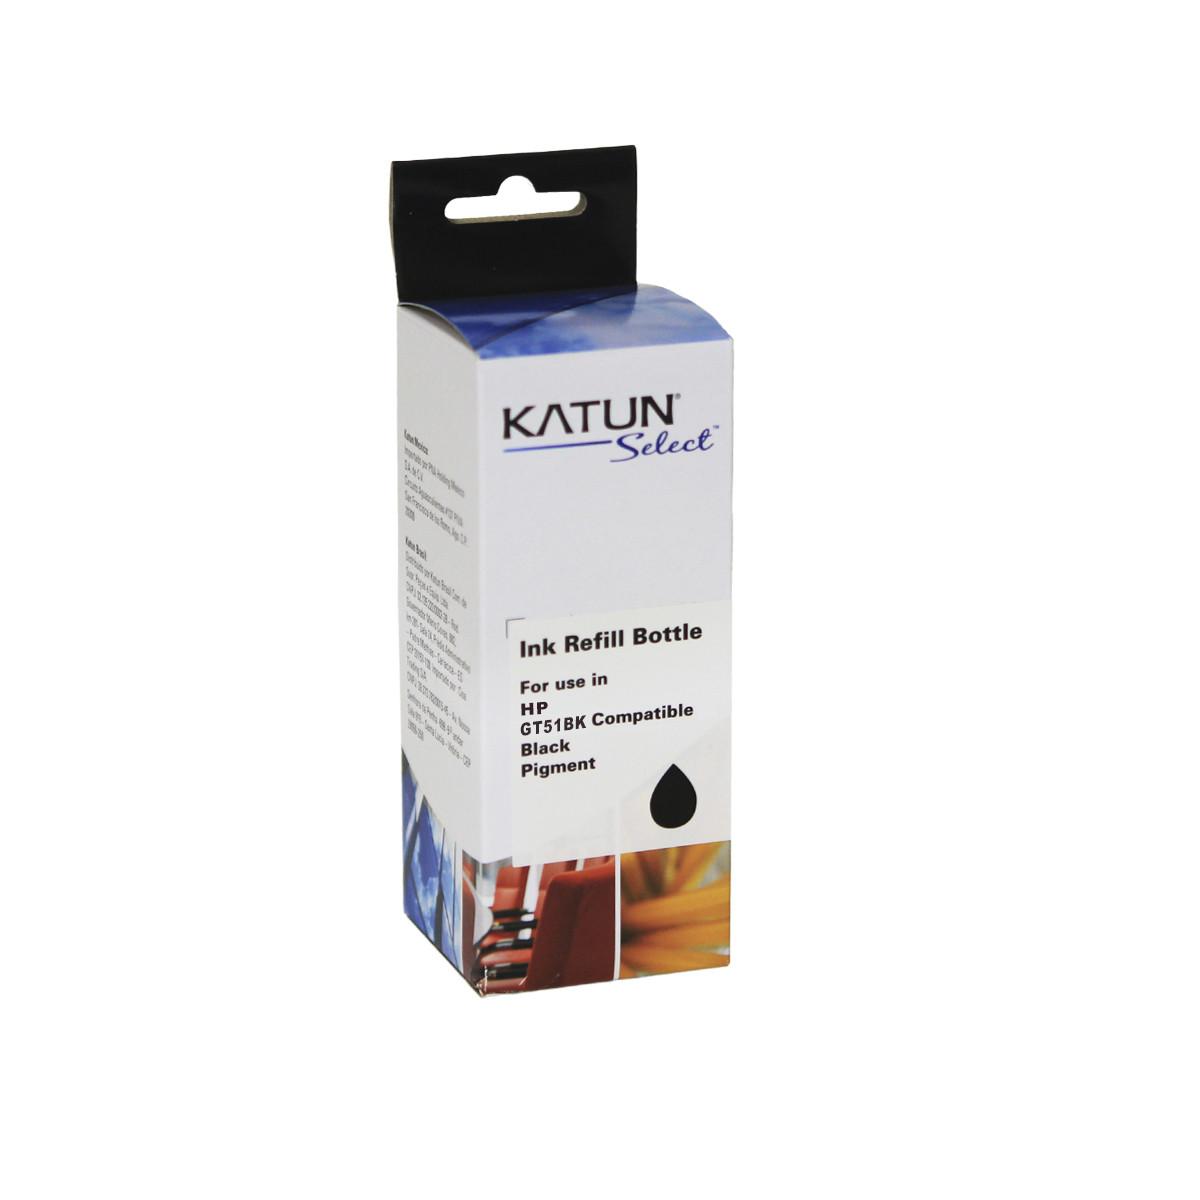 Tinta Compatível com HP GT51BK M0H57AL Preto   GT5822 GT5820 GT5810 GT5811   Katun Select 100ml